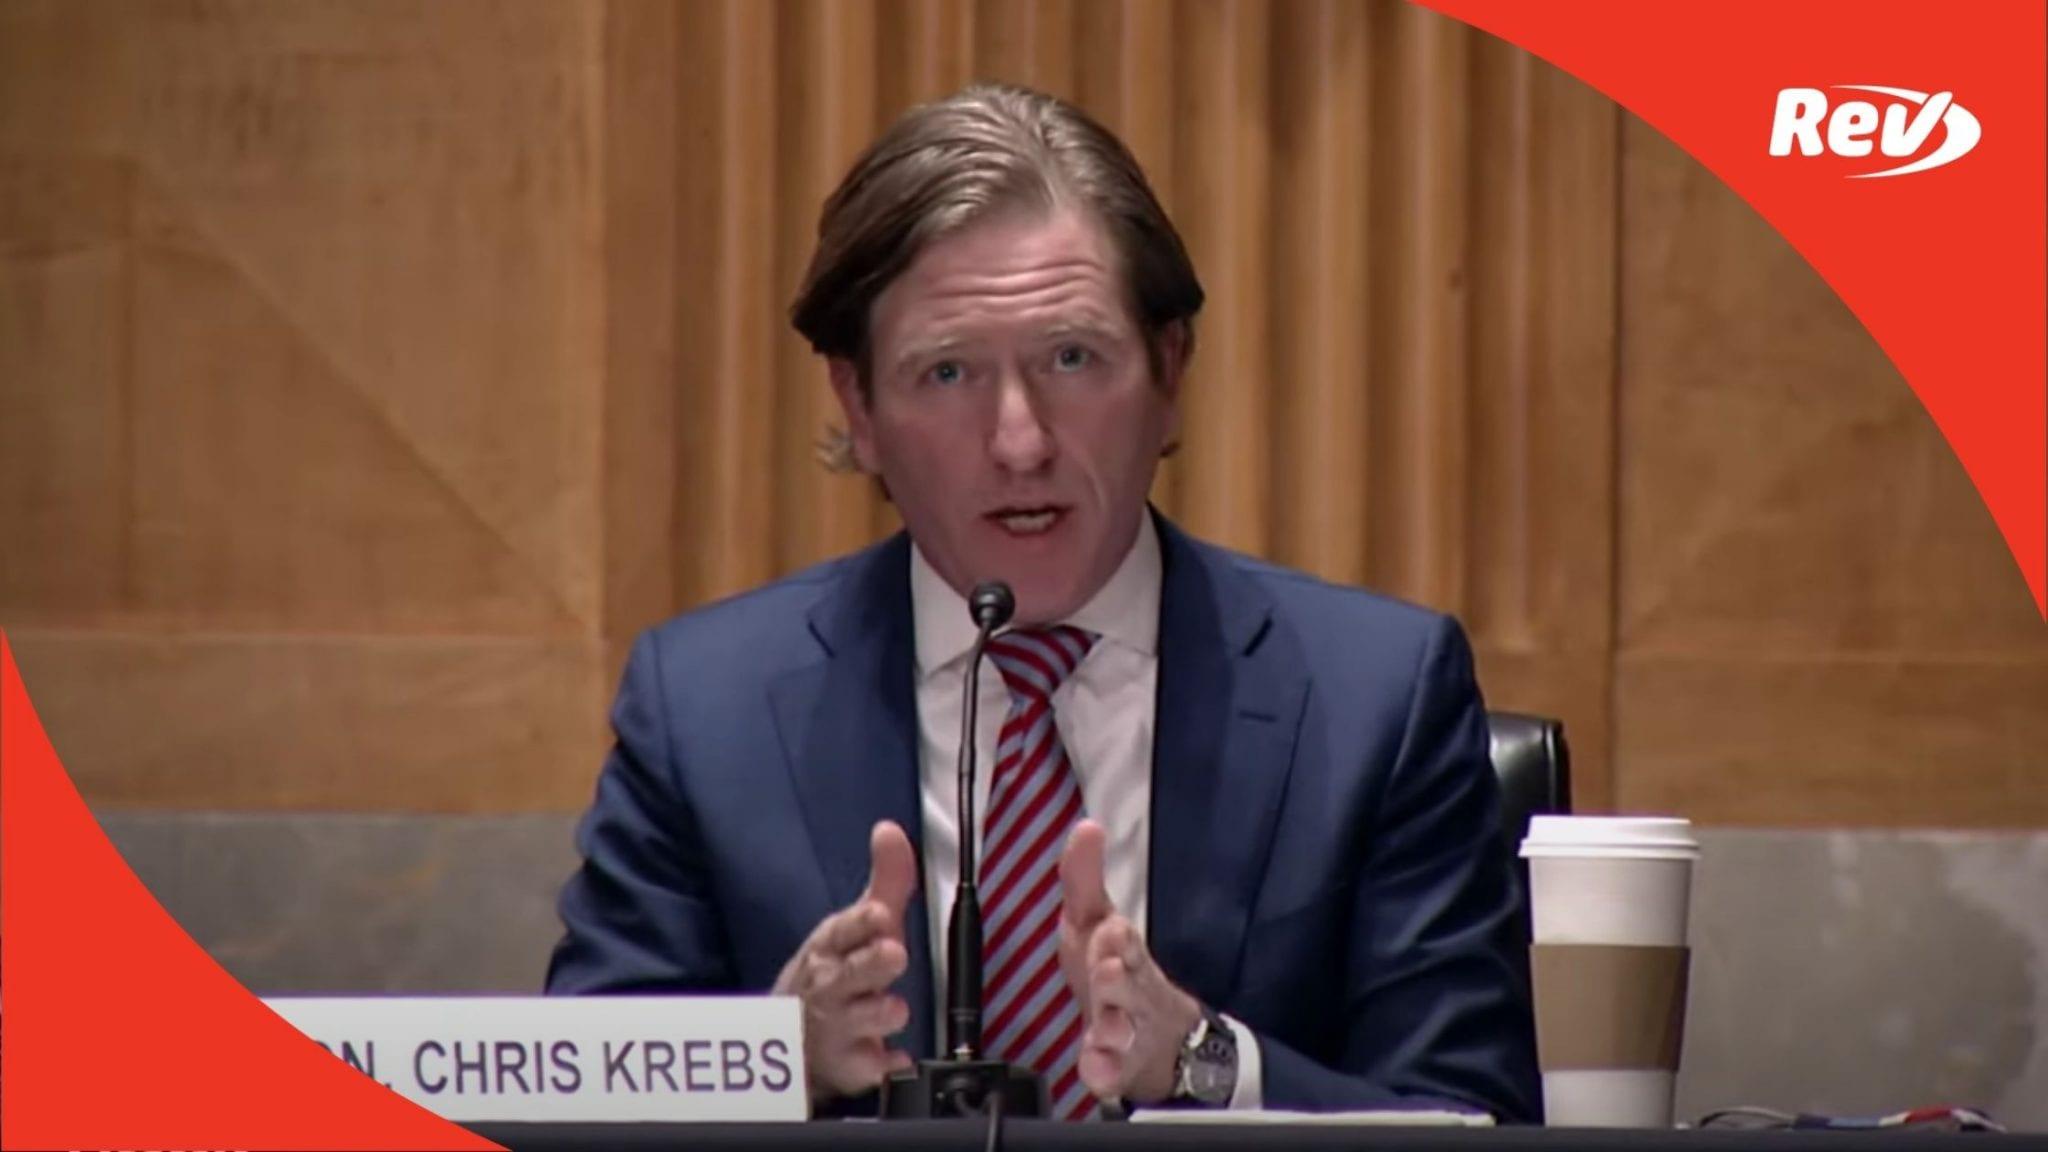 Fired Election Official Chris Krebs Senate Testimony on 2020 Election Security Transcript December 16